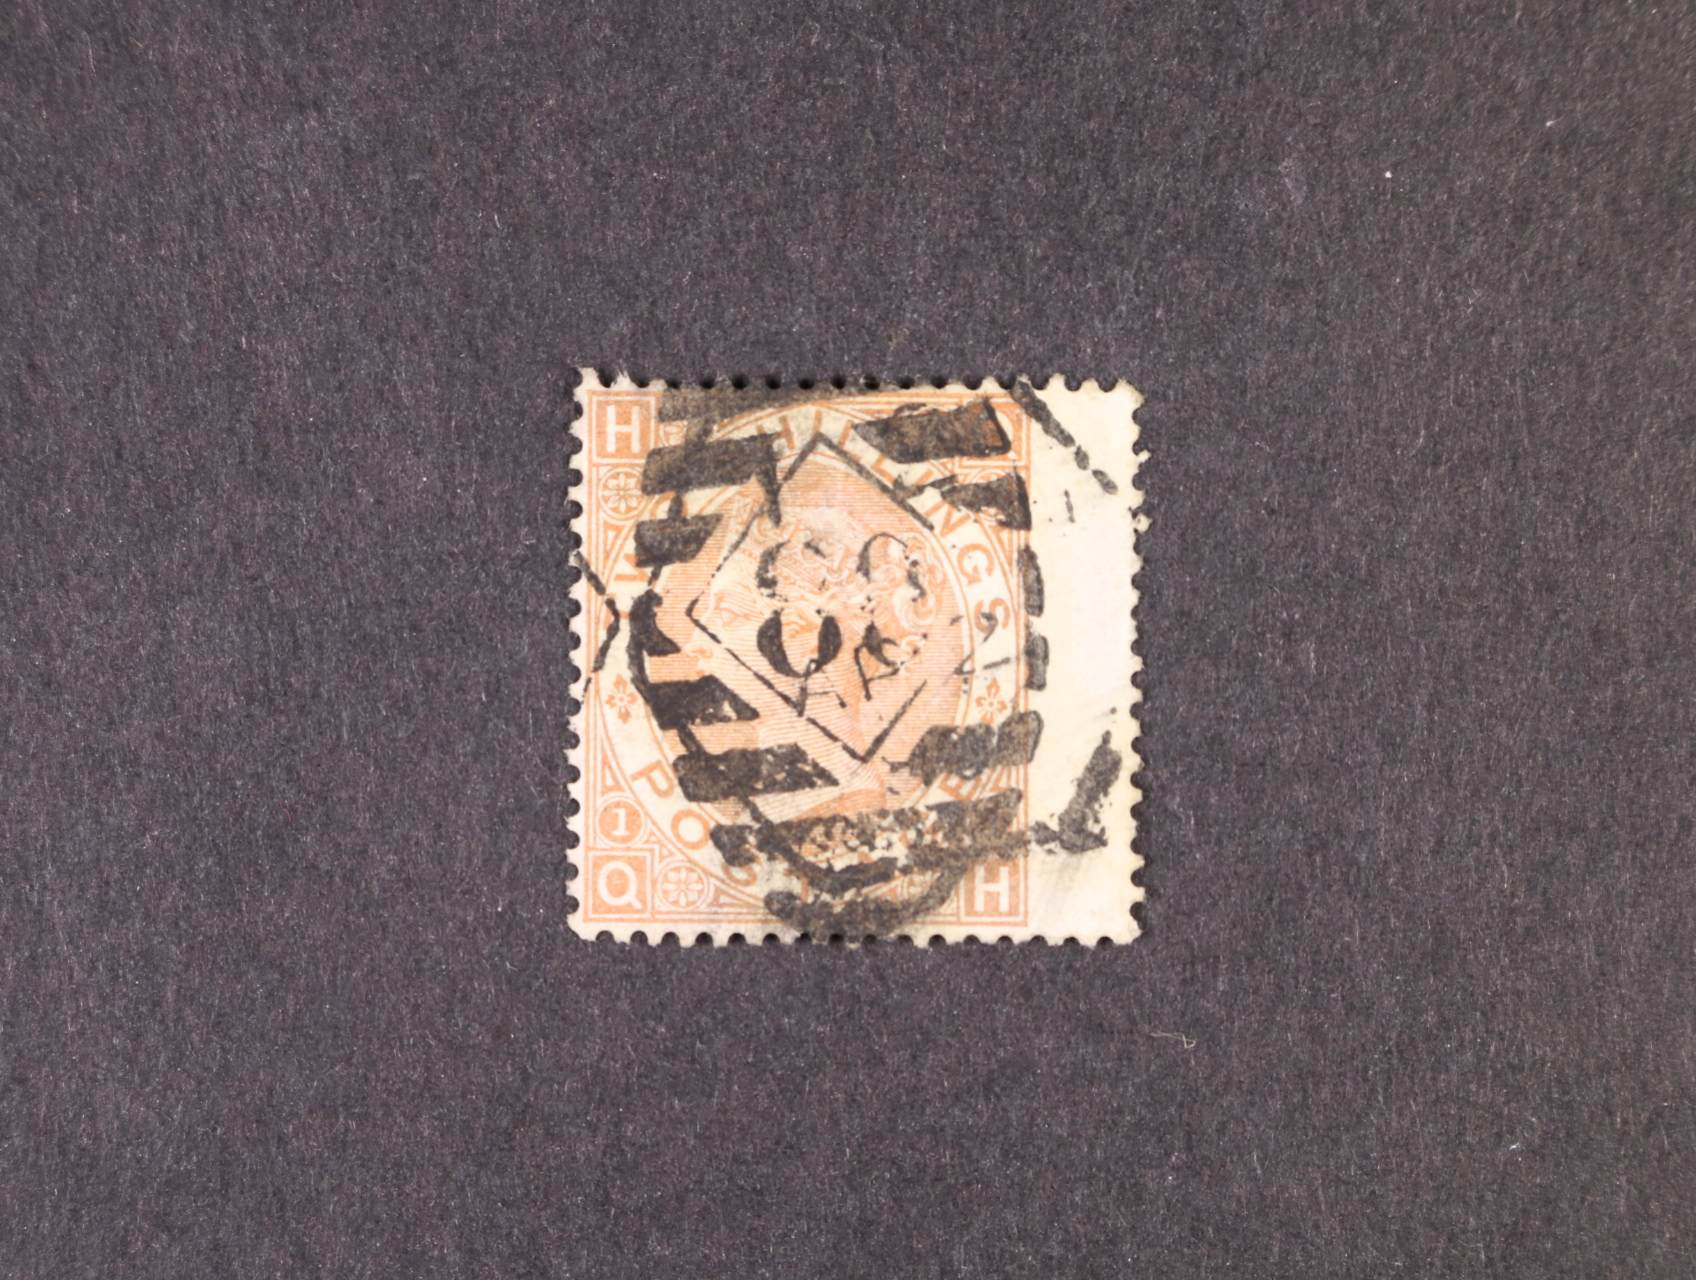 zn. Mi. č. 54, Pl. 1, s pravým okrajem, 2000 EUR